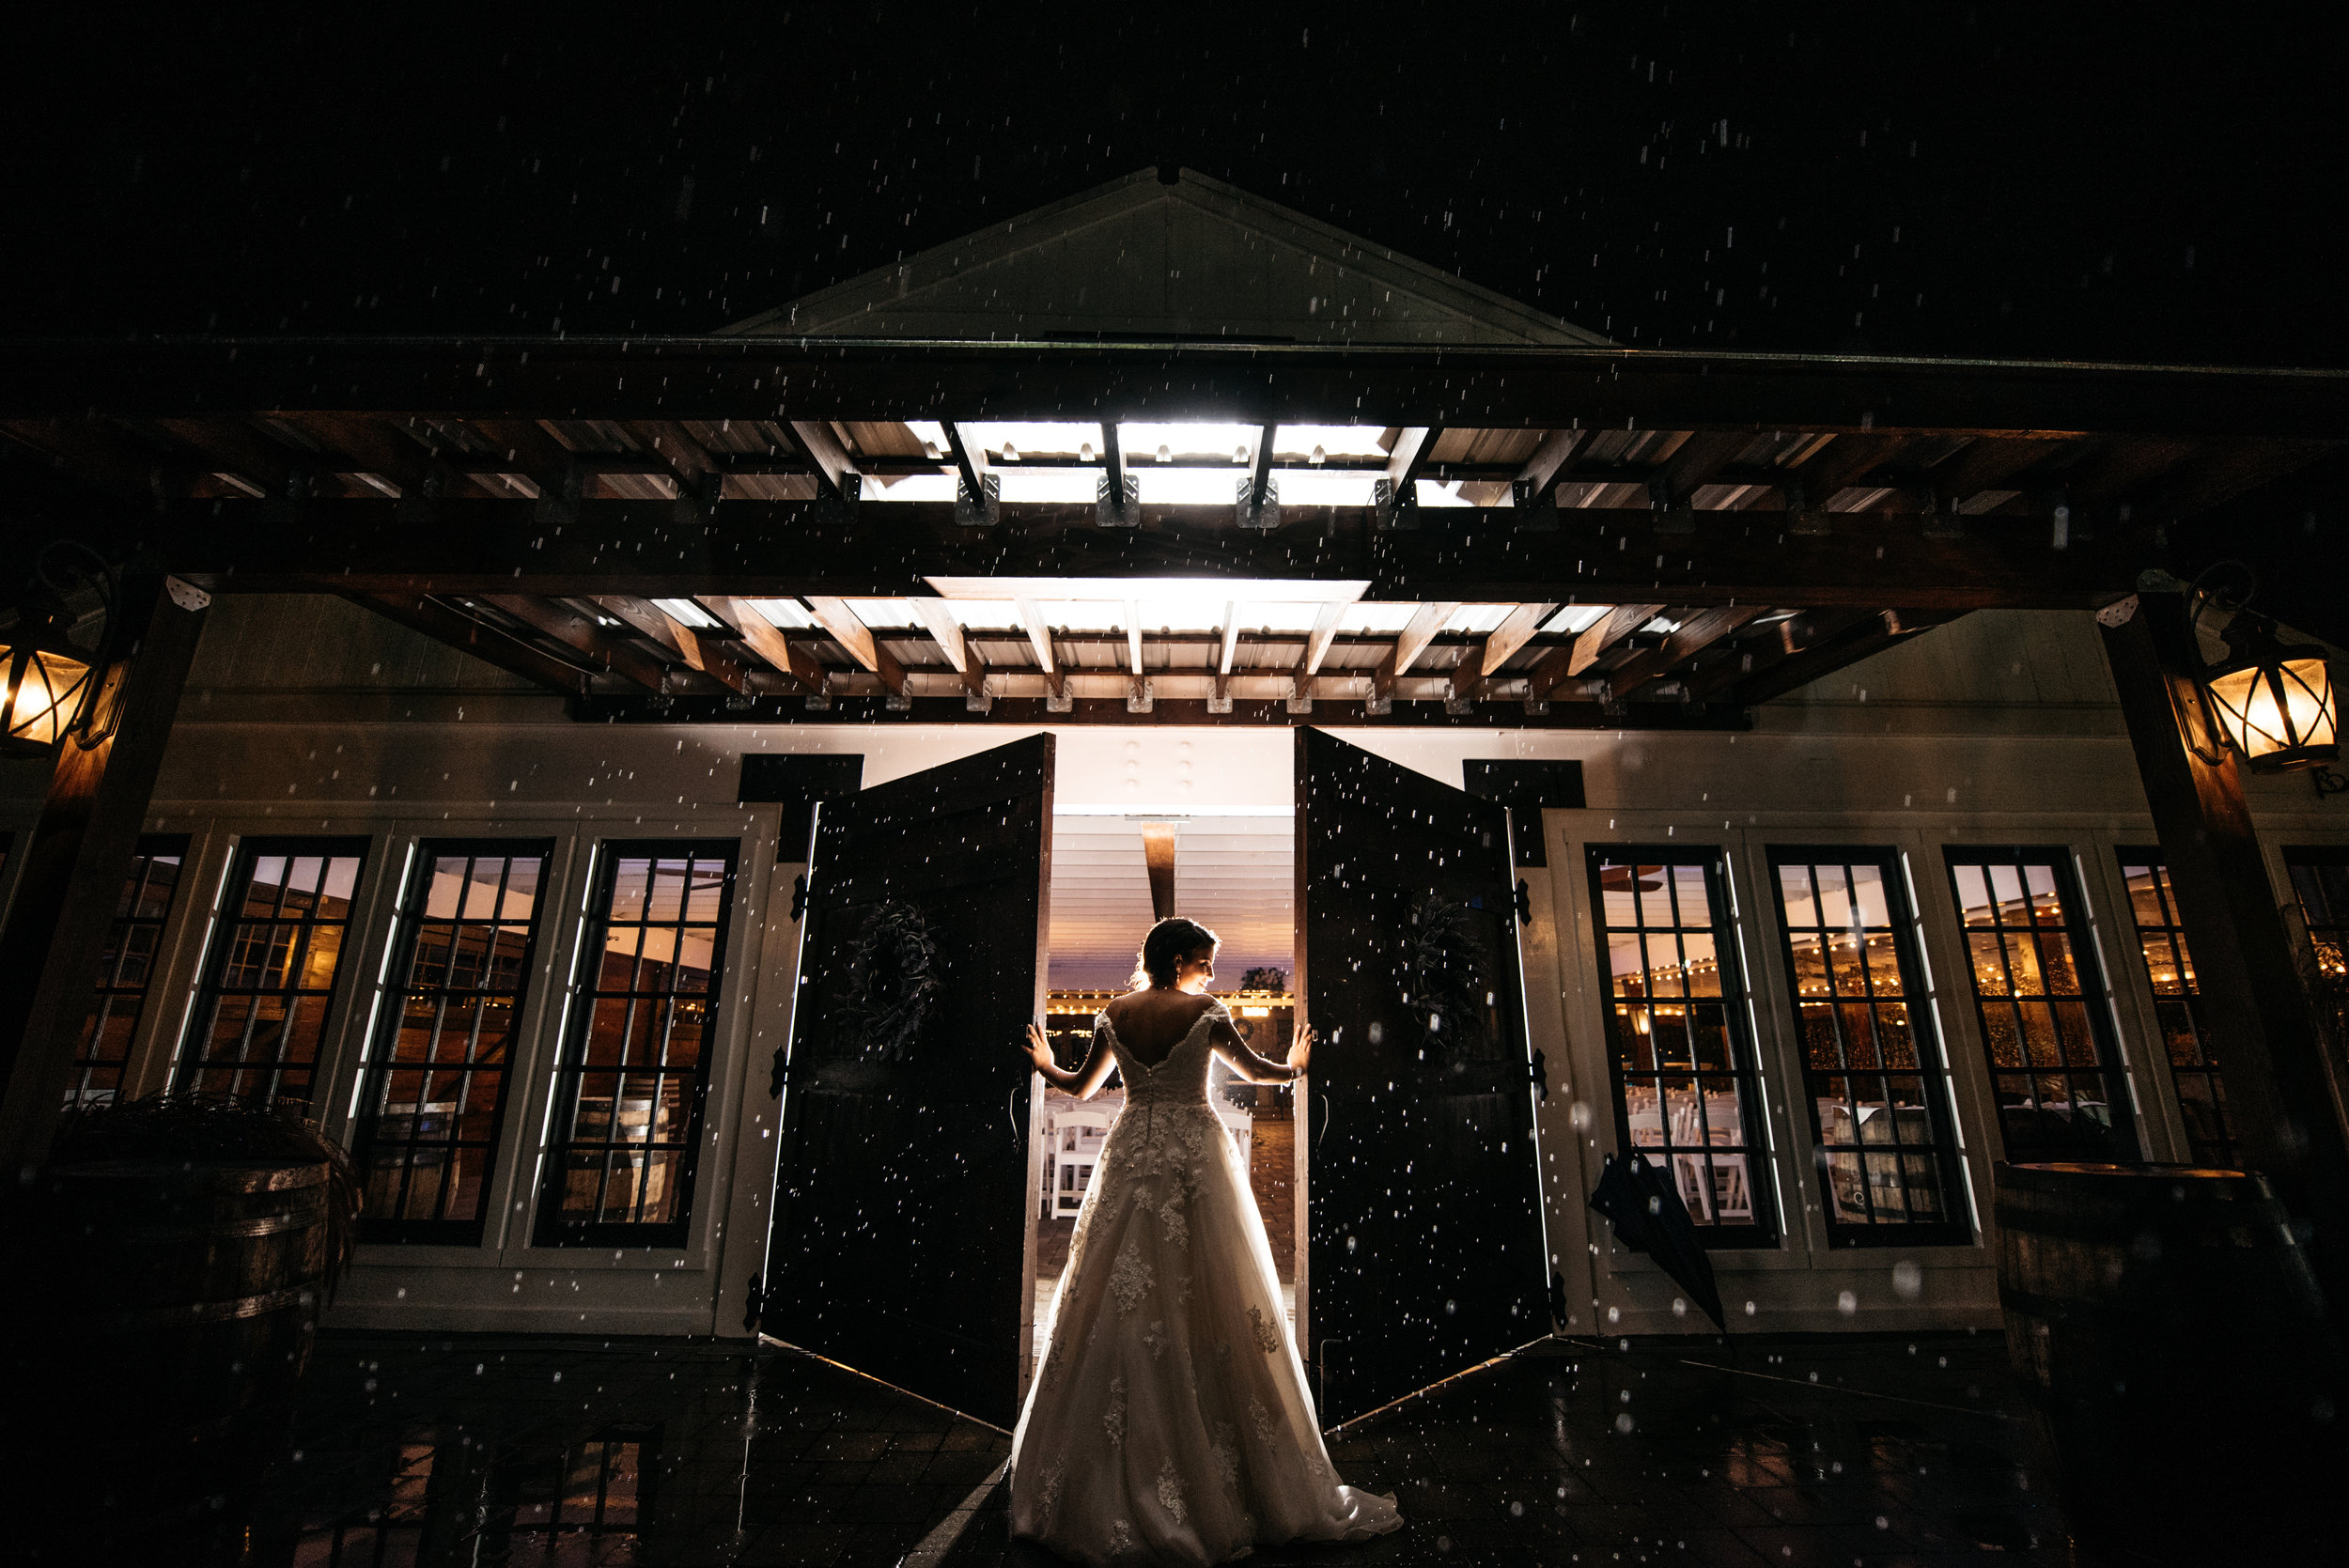 WeddingPhotos | NJPhotographer | Highlights-8-19.jpg